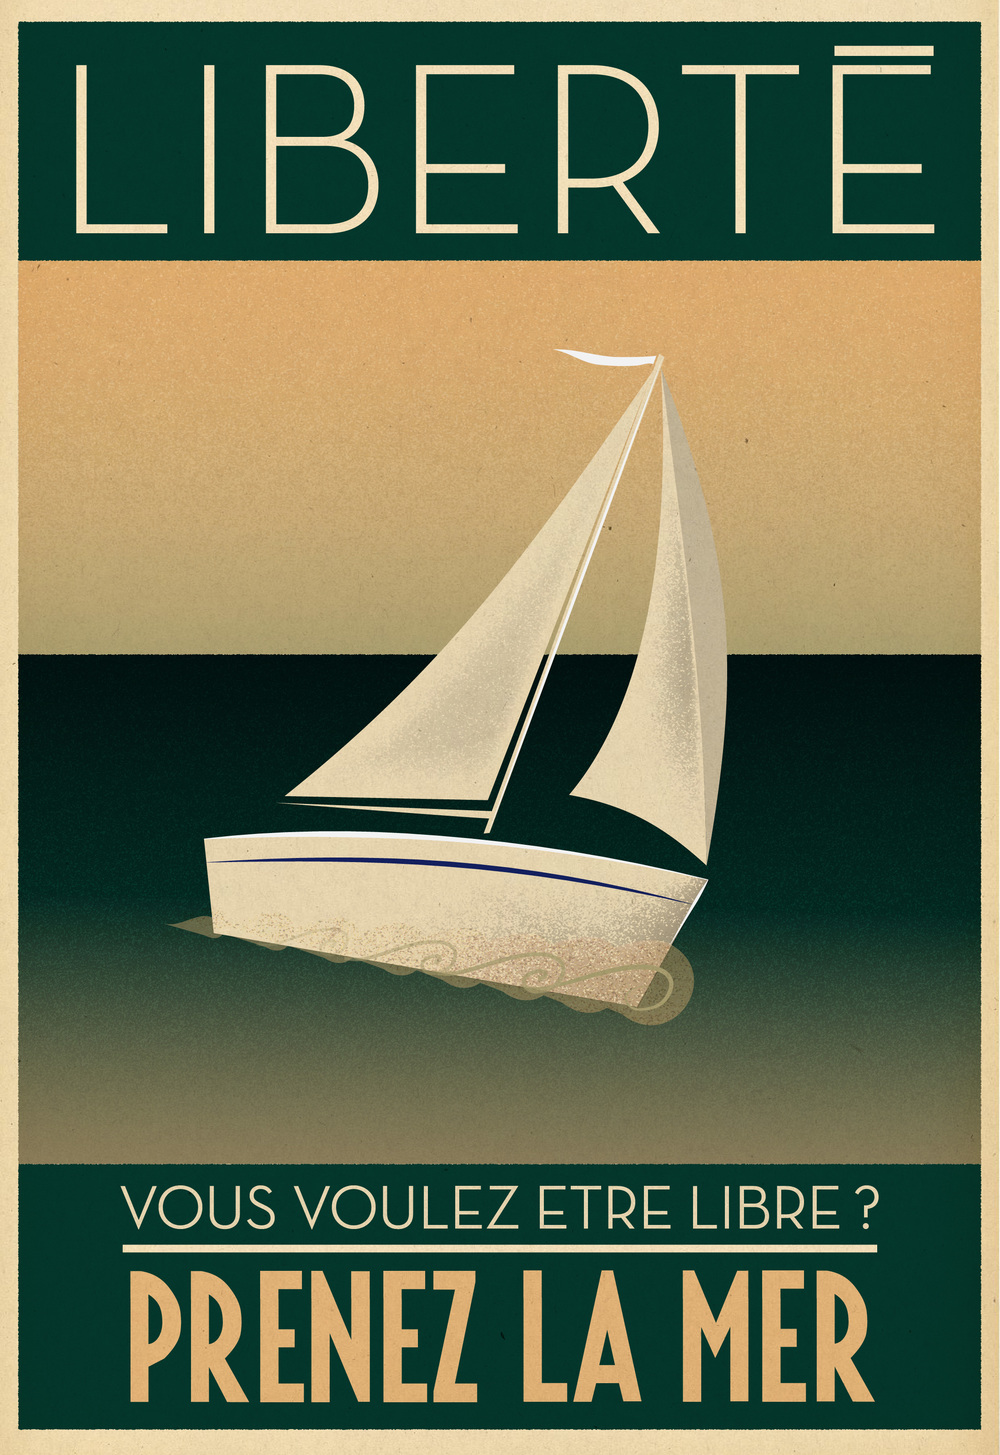 affiche bateau-01.jpg